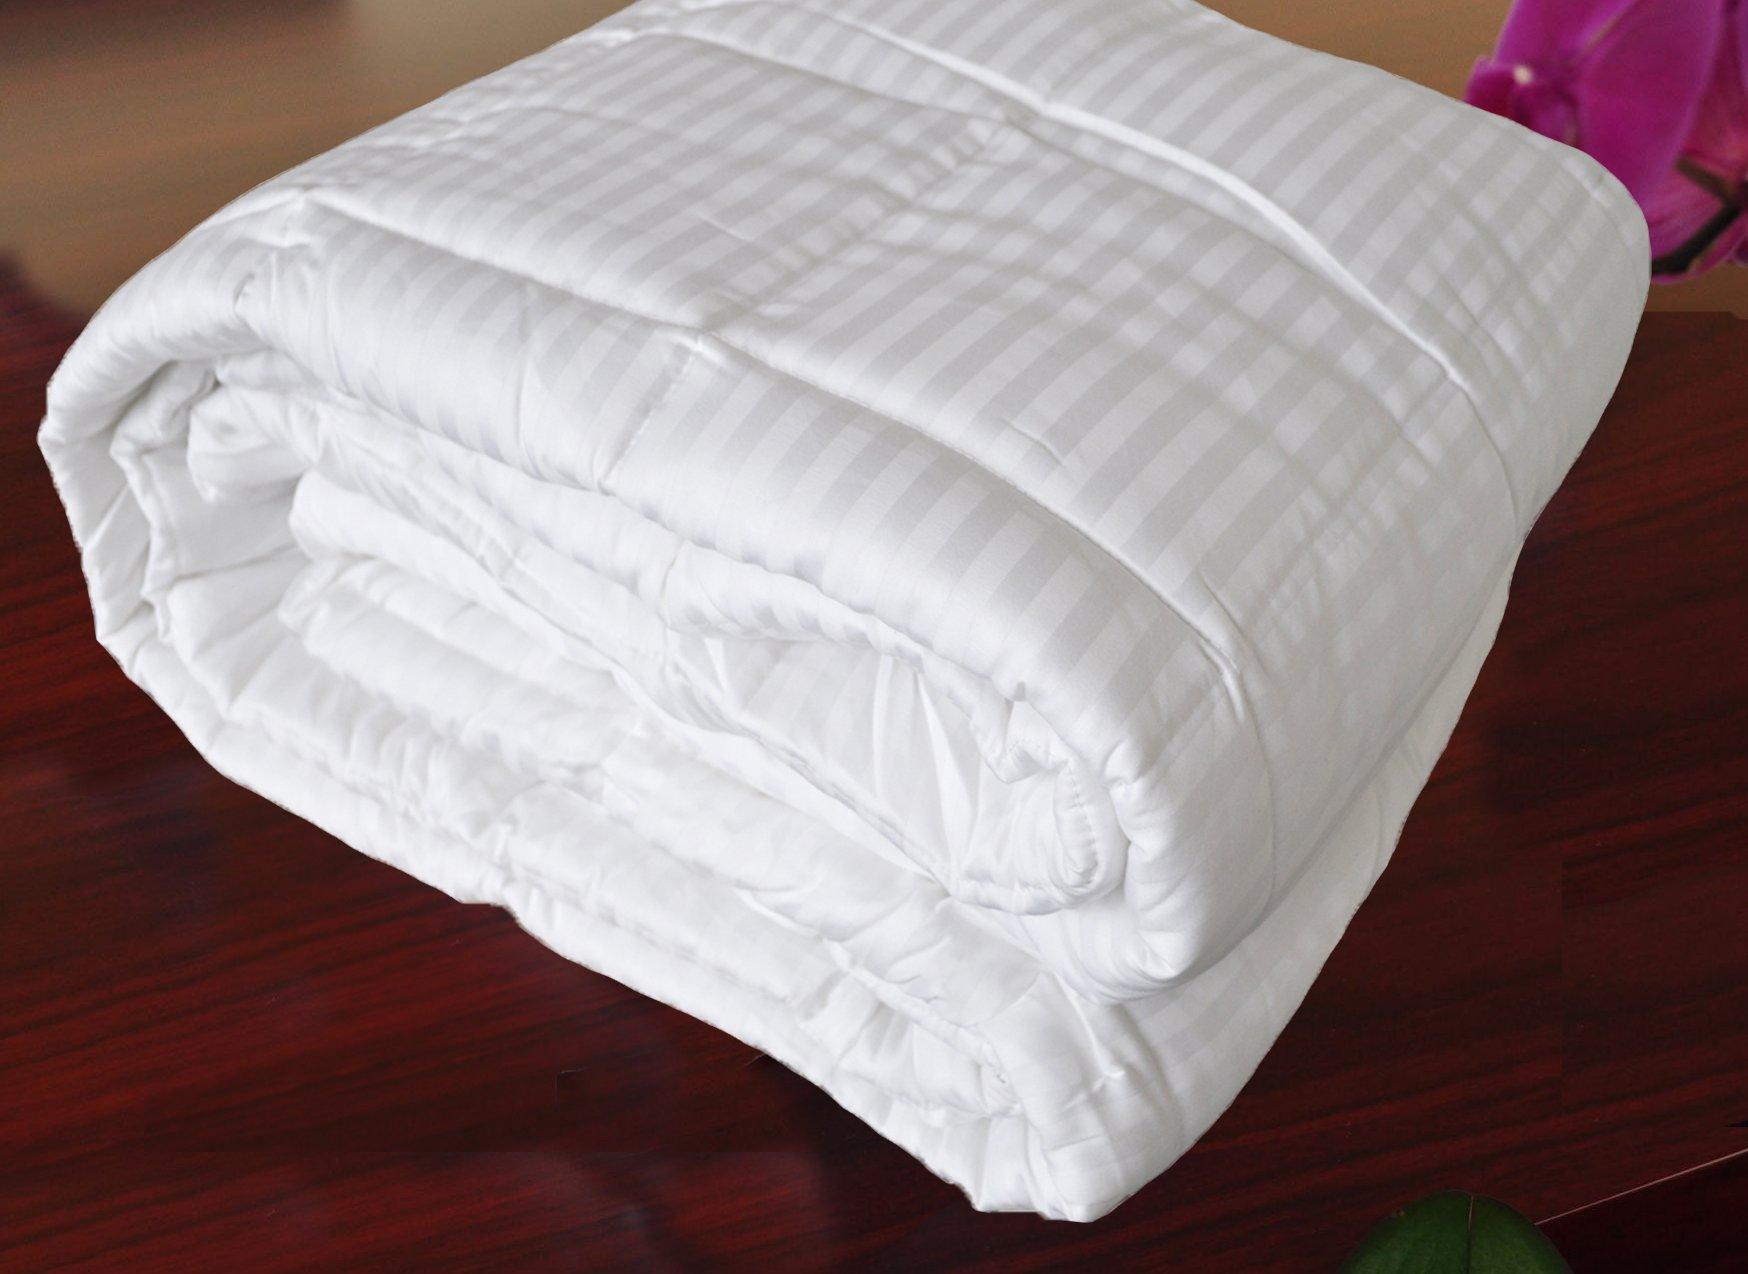 Natural Comfort Hotel Select 250TC Down Alternative White Oversize Comforter, Duvet Cover Insert, Queen